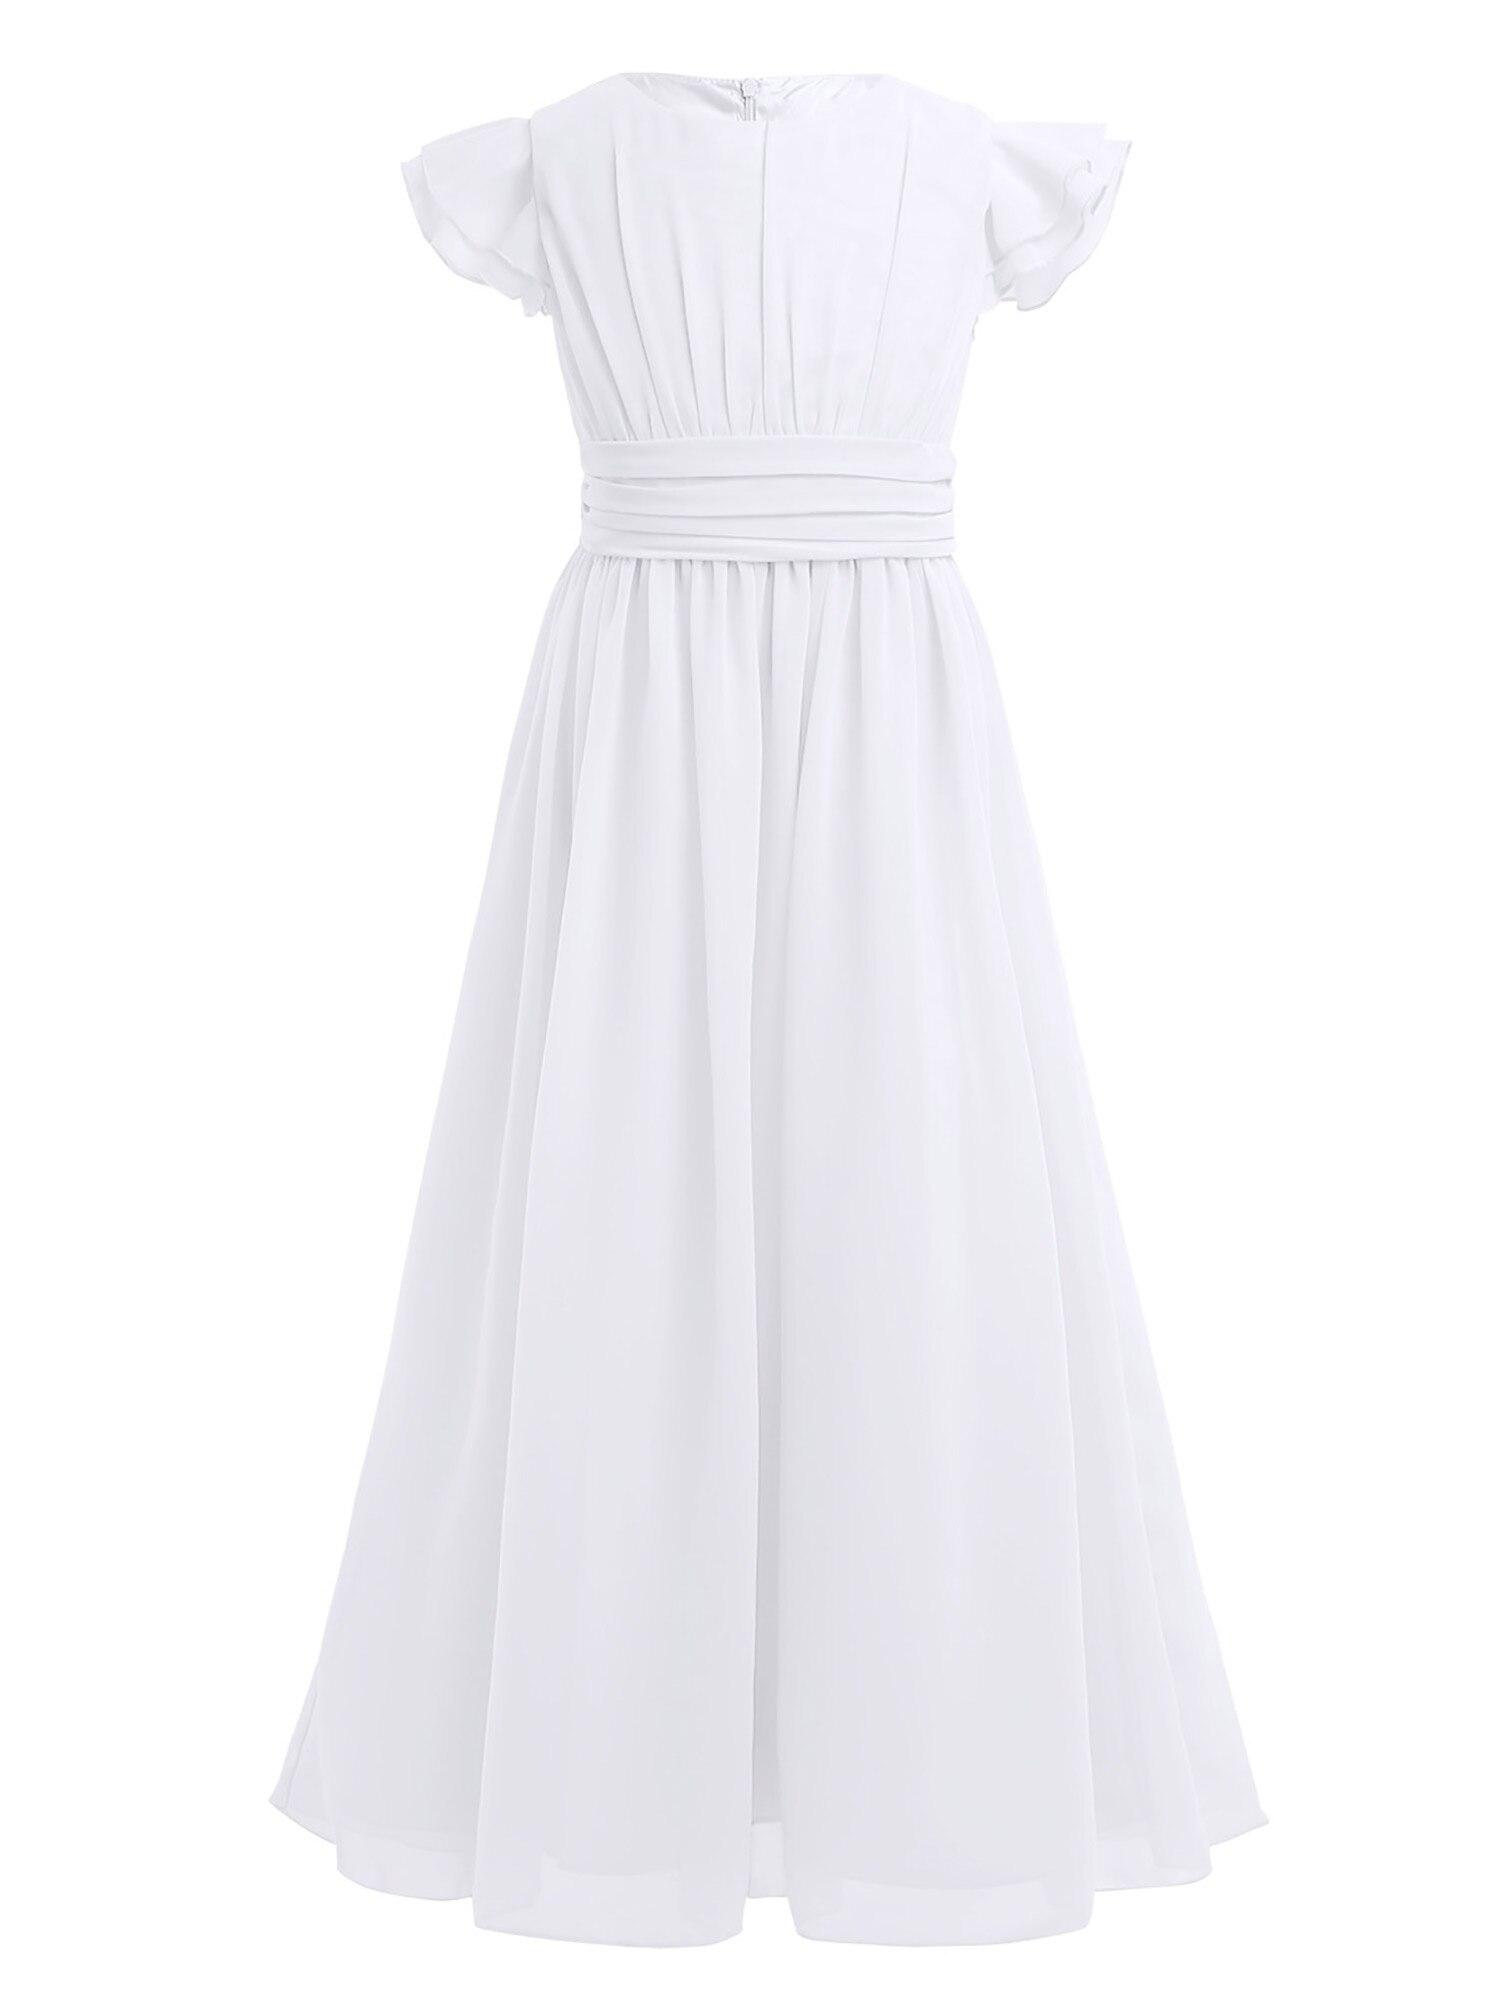 Image 5 - Girls Chiffon Flutter Sleeves Flower Girl Dress Pleated High waisted Princess Pageant Birthday Wedding Party Long Dress SZ 4 14Flower Girl Dresses   -